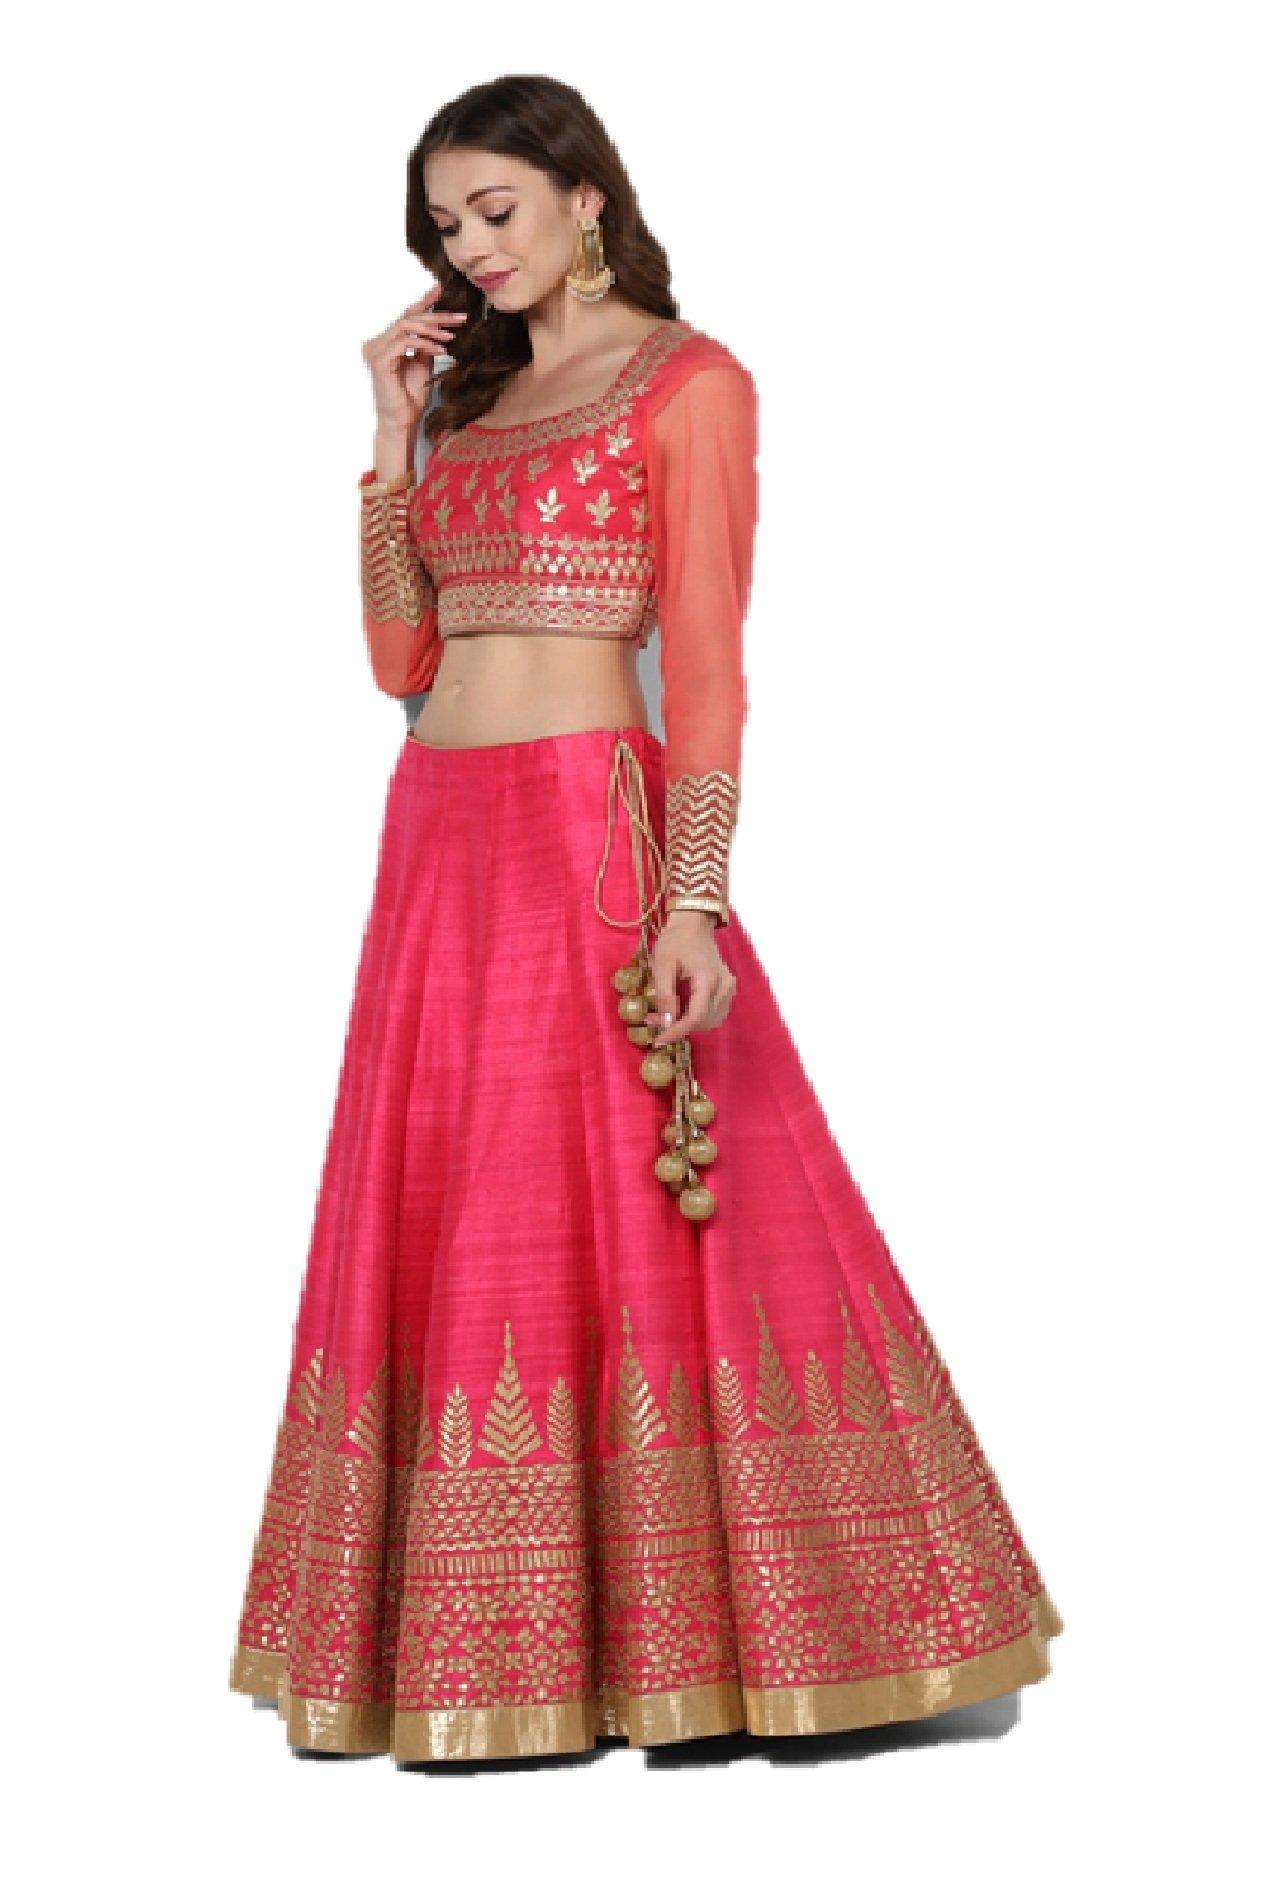 55231fbd0e Pushp Paridhan New Collection Stylish Traditional Ethnic Wear Gota Patti  Work Hot Pink Lehenga Choli Set For Women